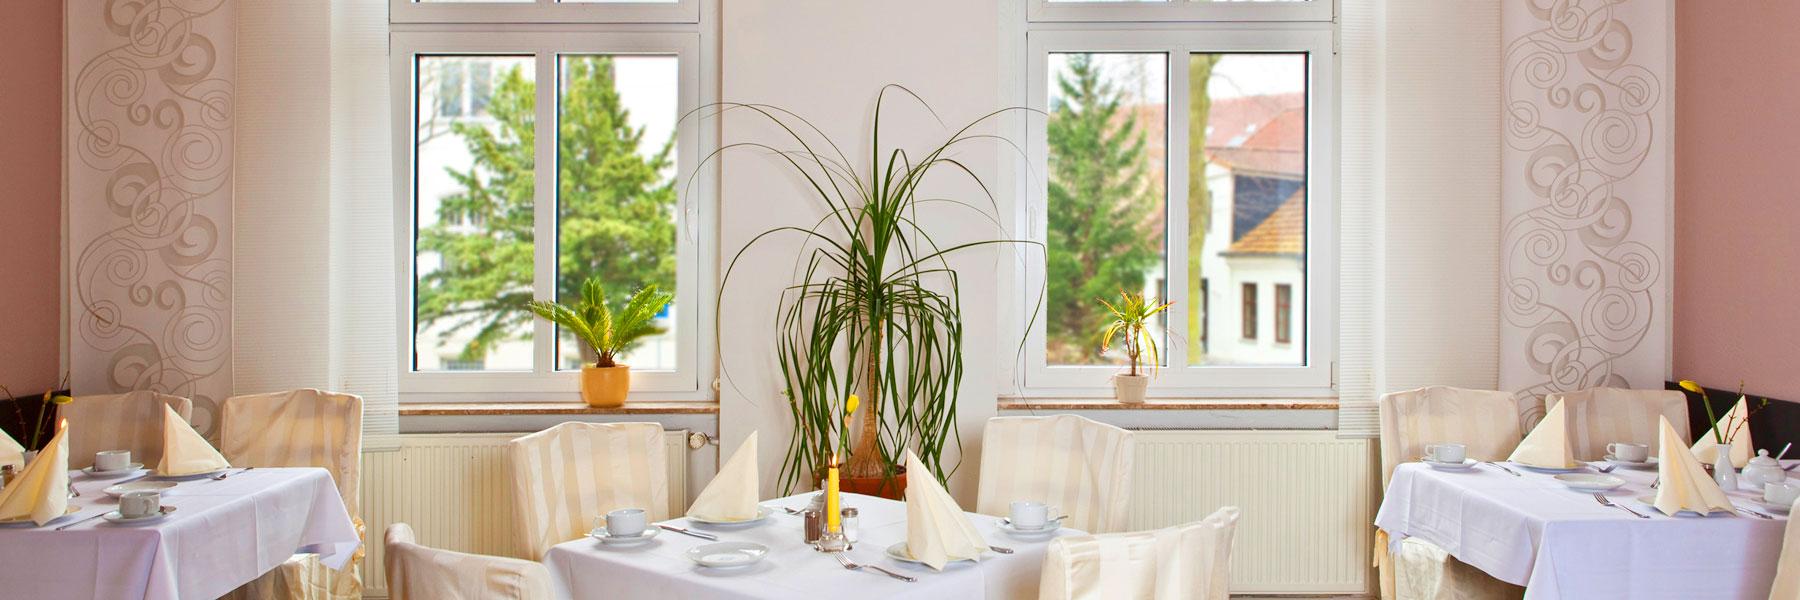 Restaurant - Hotel Adler garni Greifswald